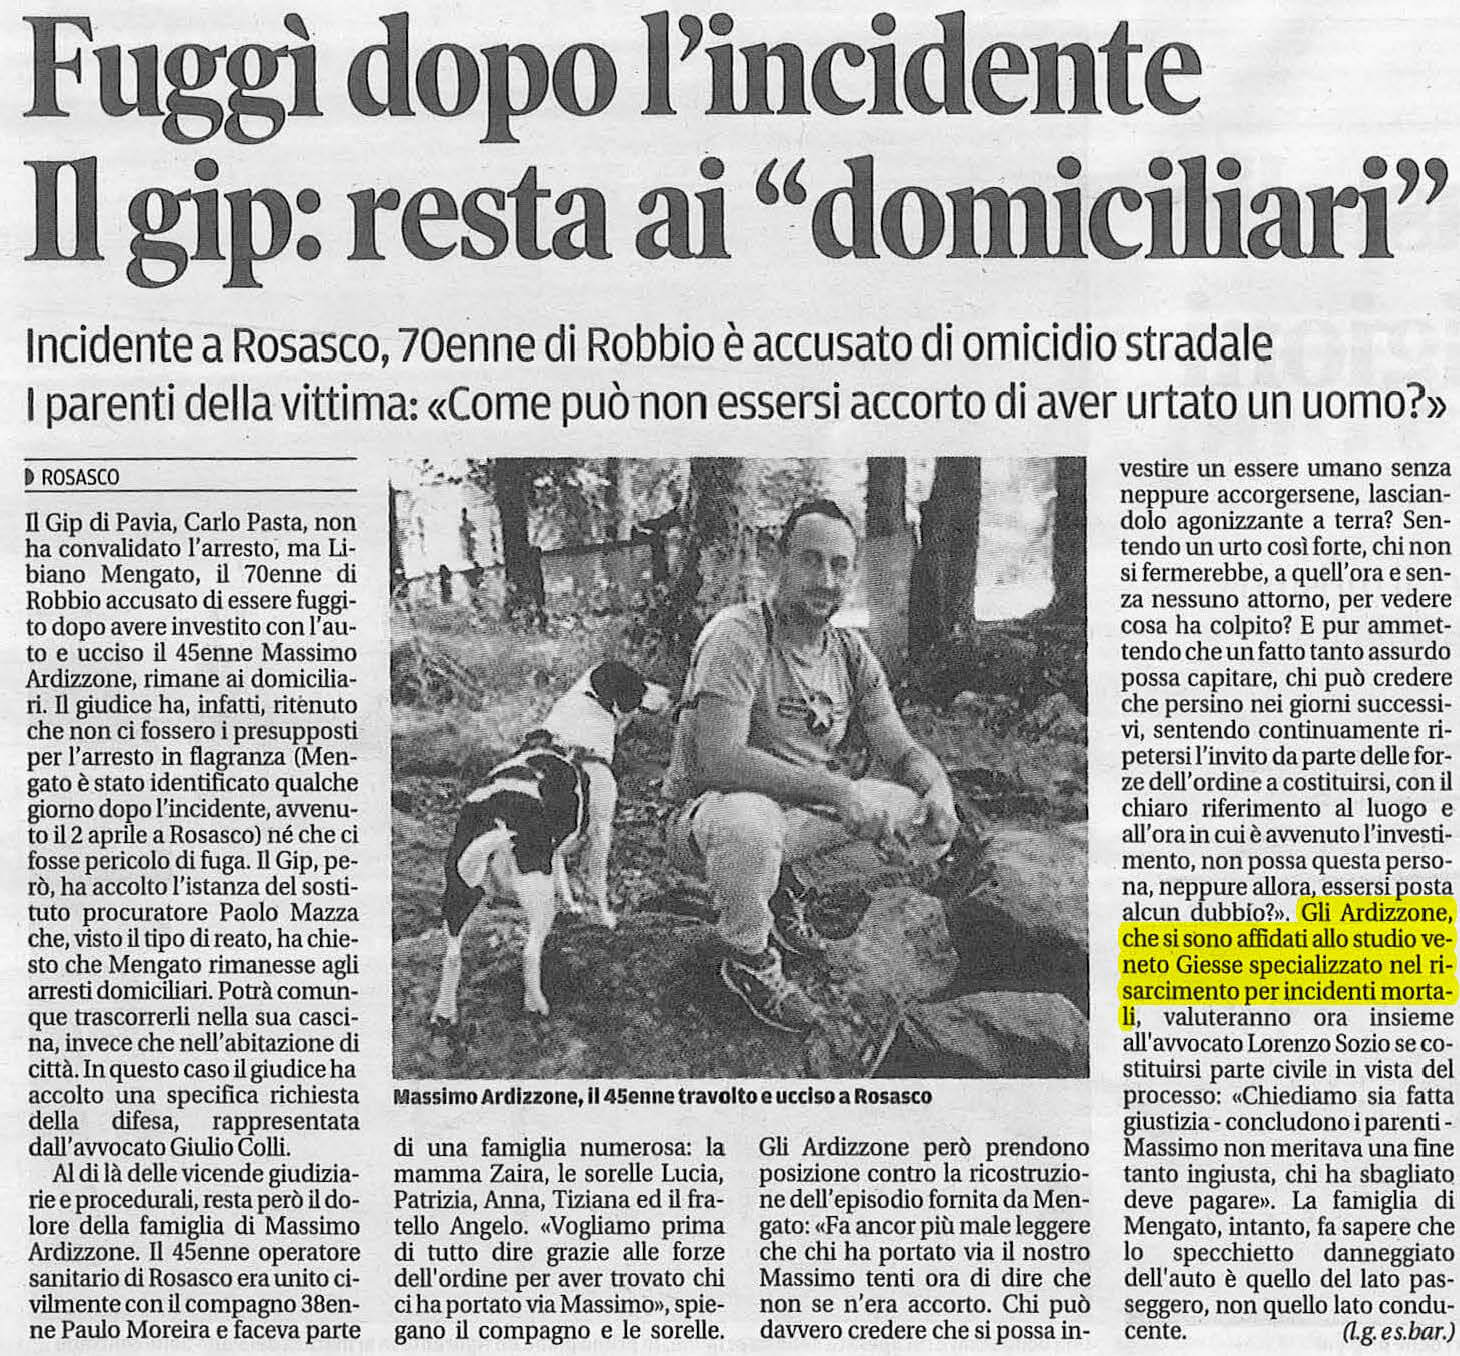 Quotidiano Incidente stradale Rosasco Pavia Giesse Risarcimento Danni